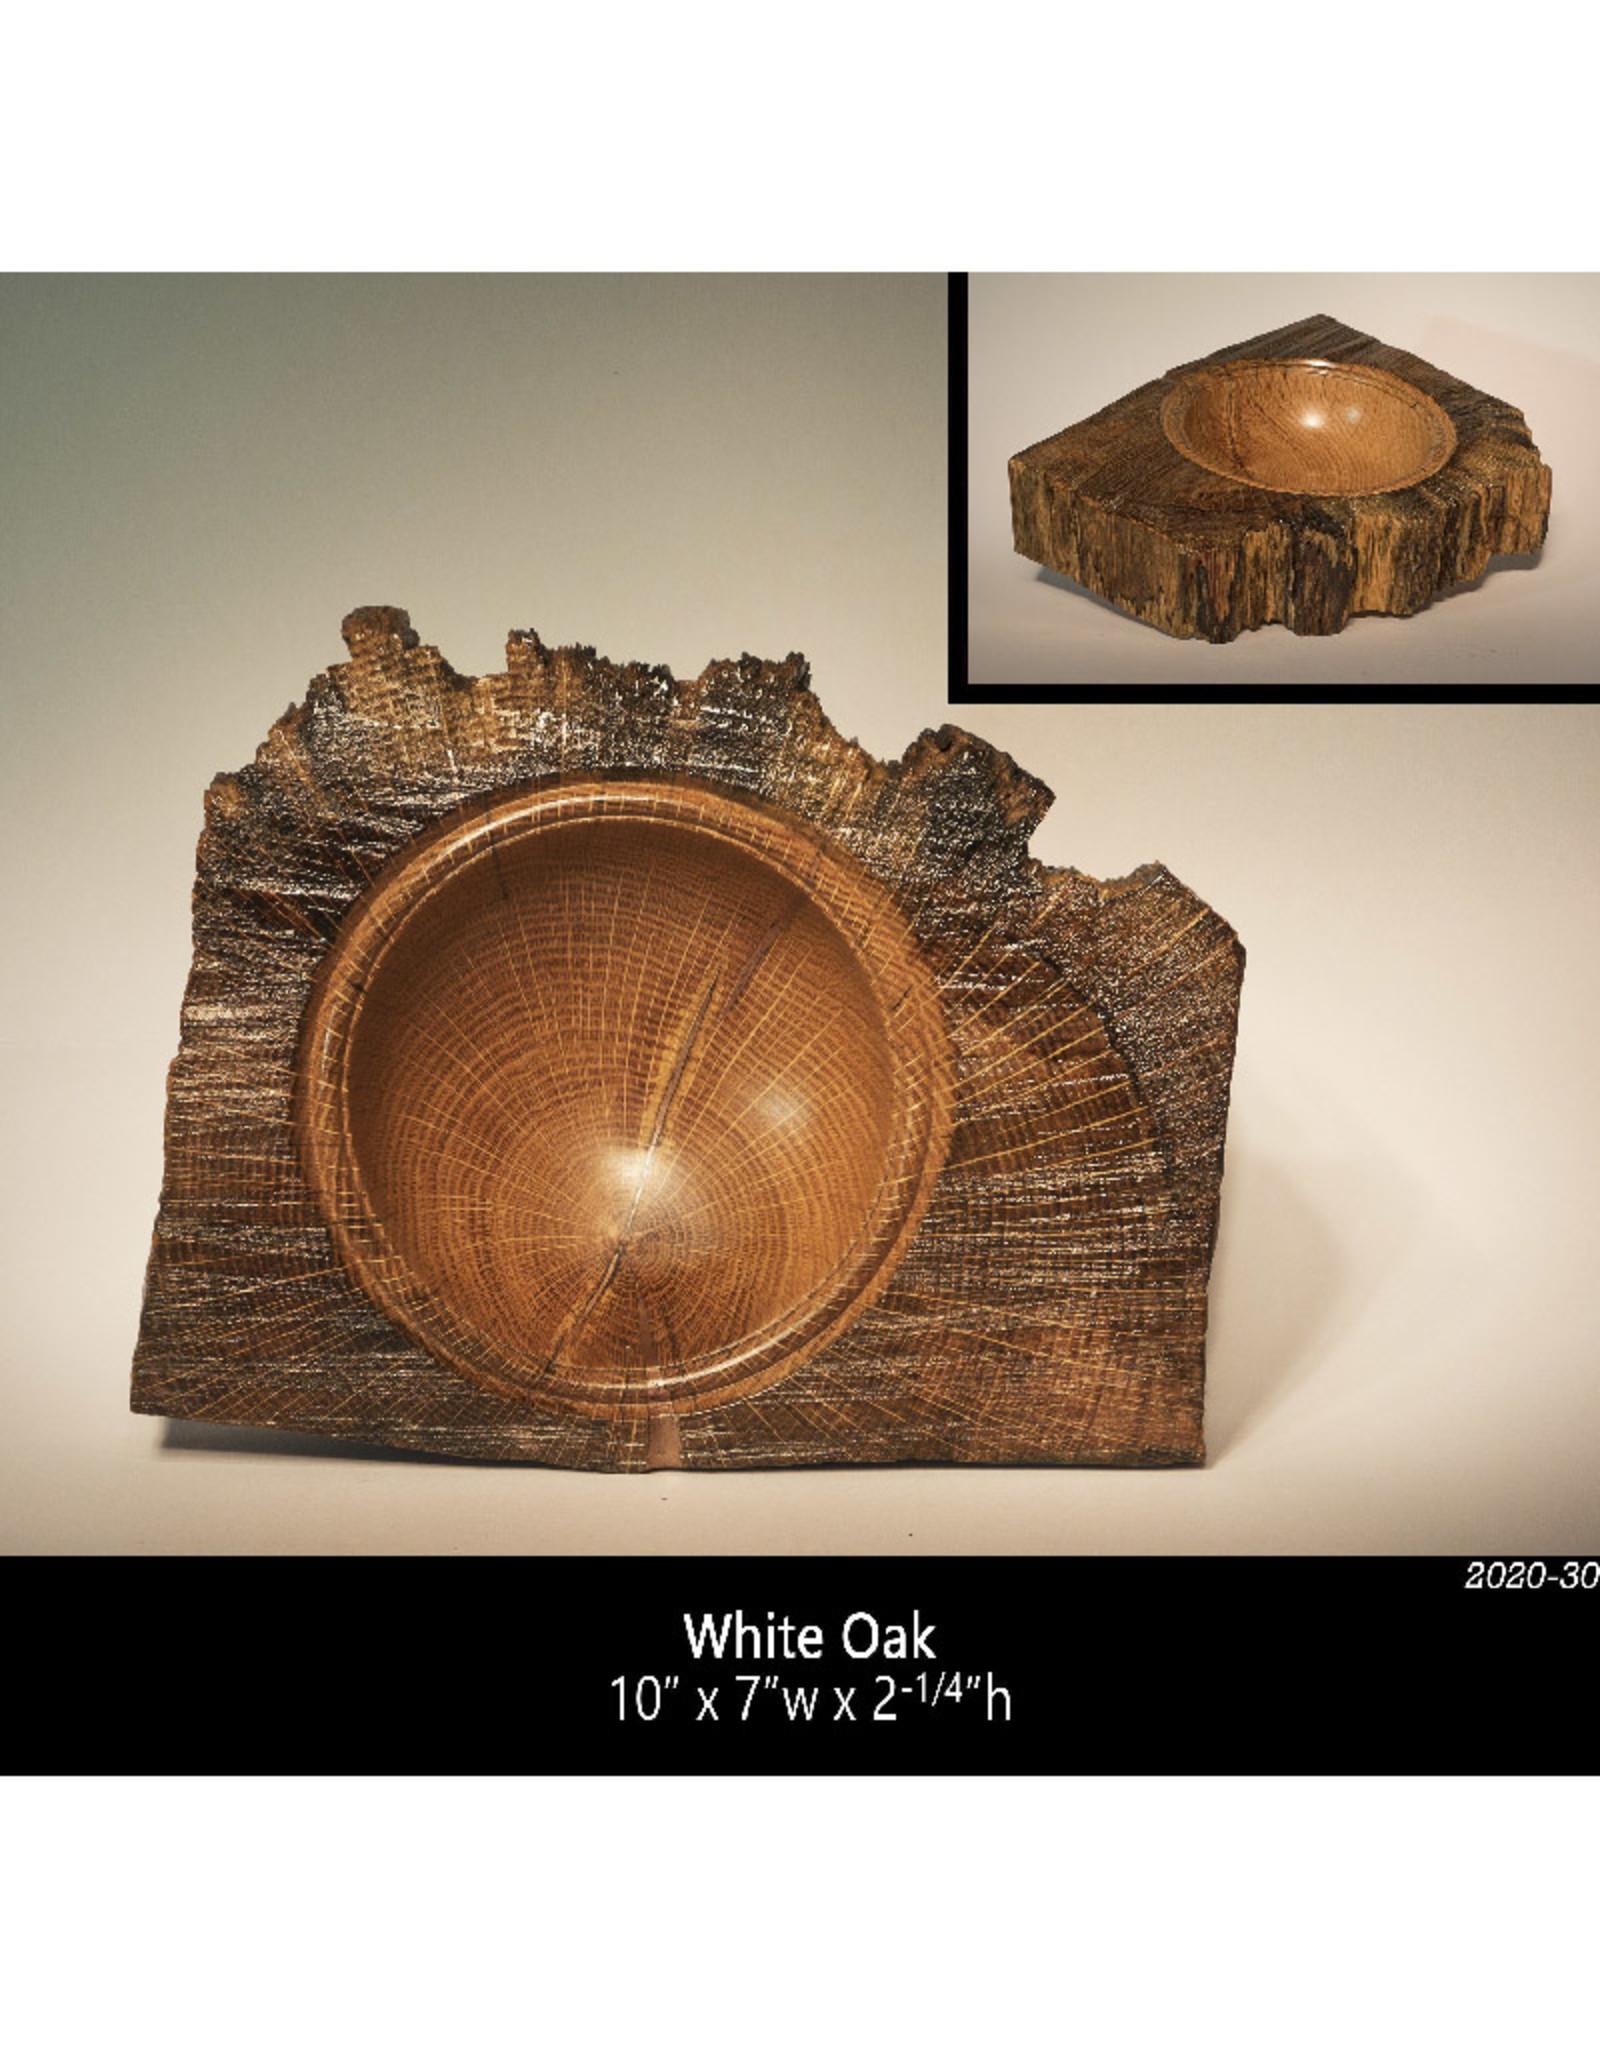 2020-30 White Oak Slab Bowl Jeff Strickler